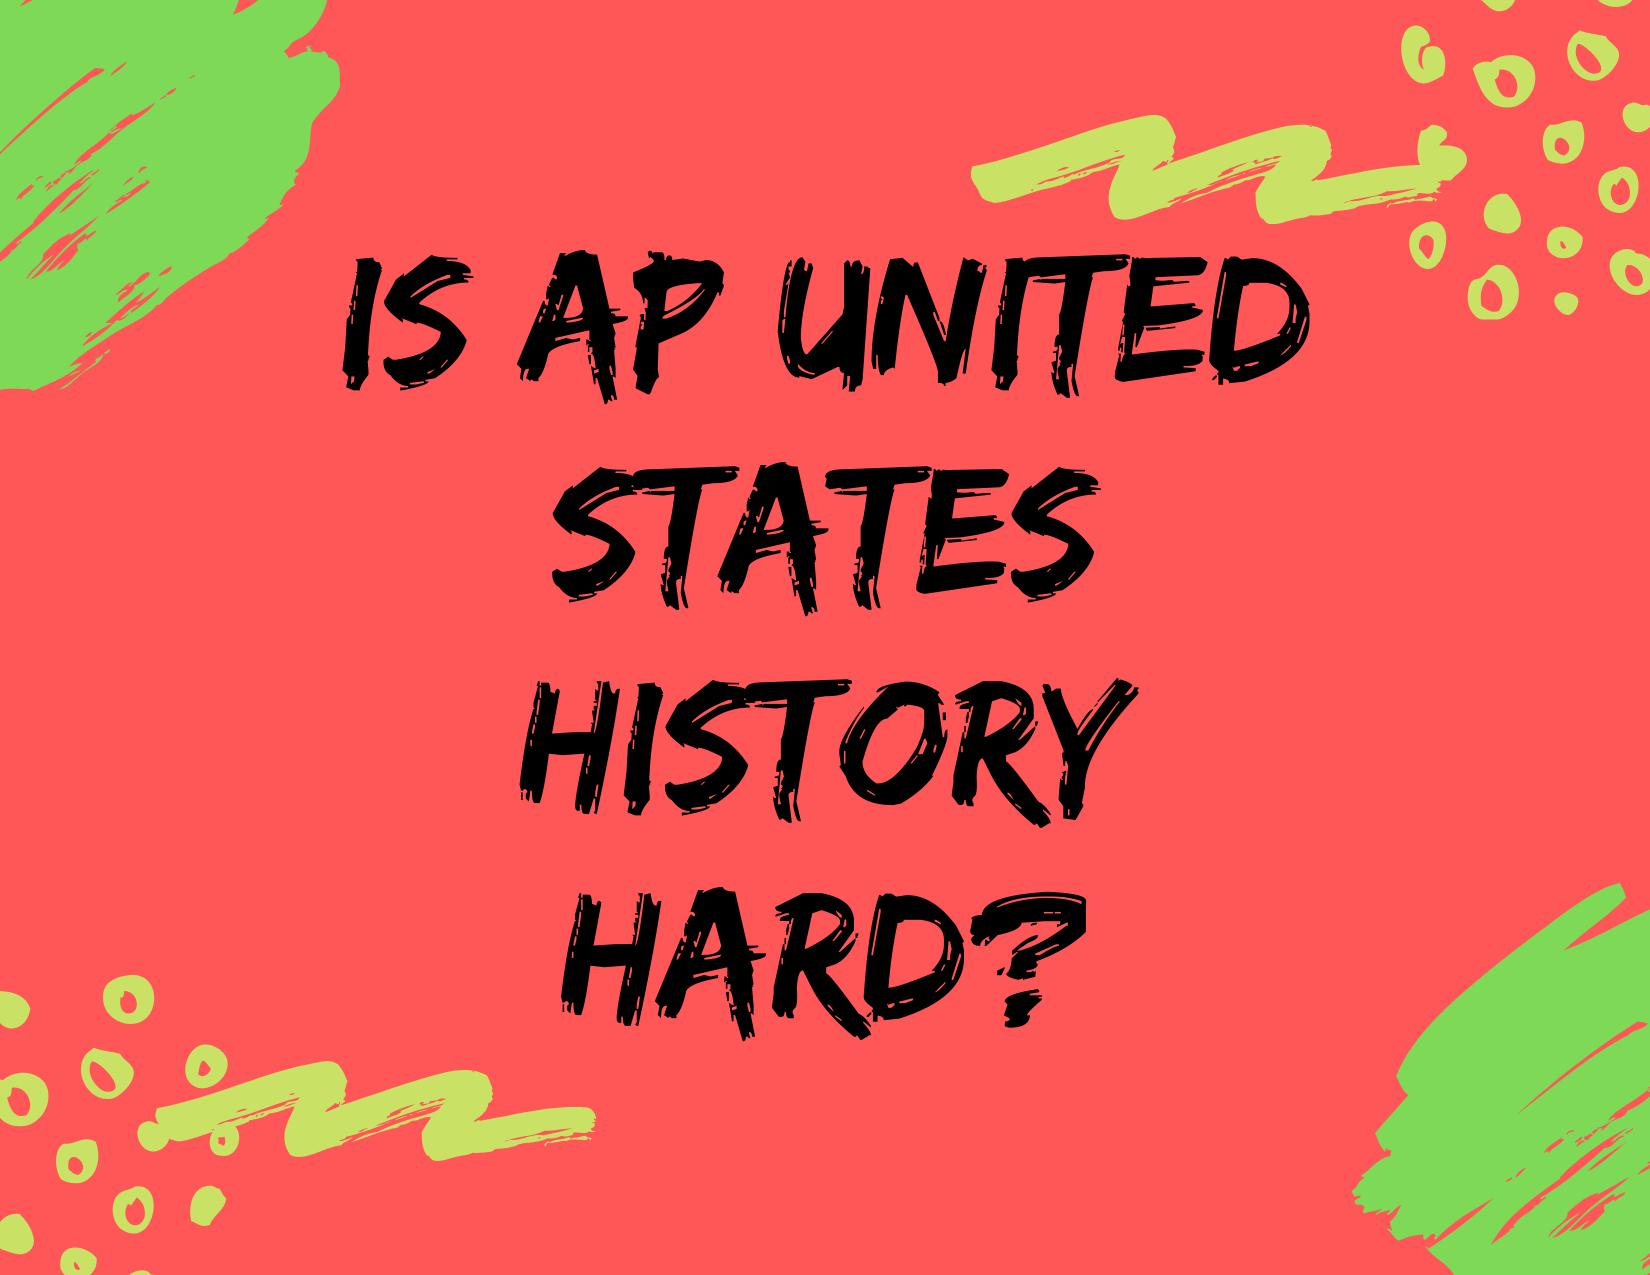 Is AP united States History Hard?